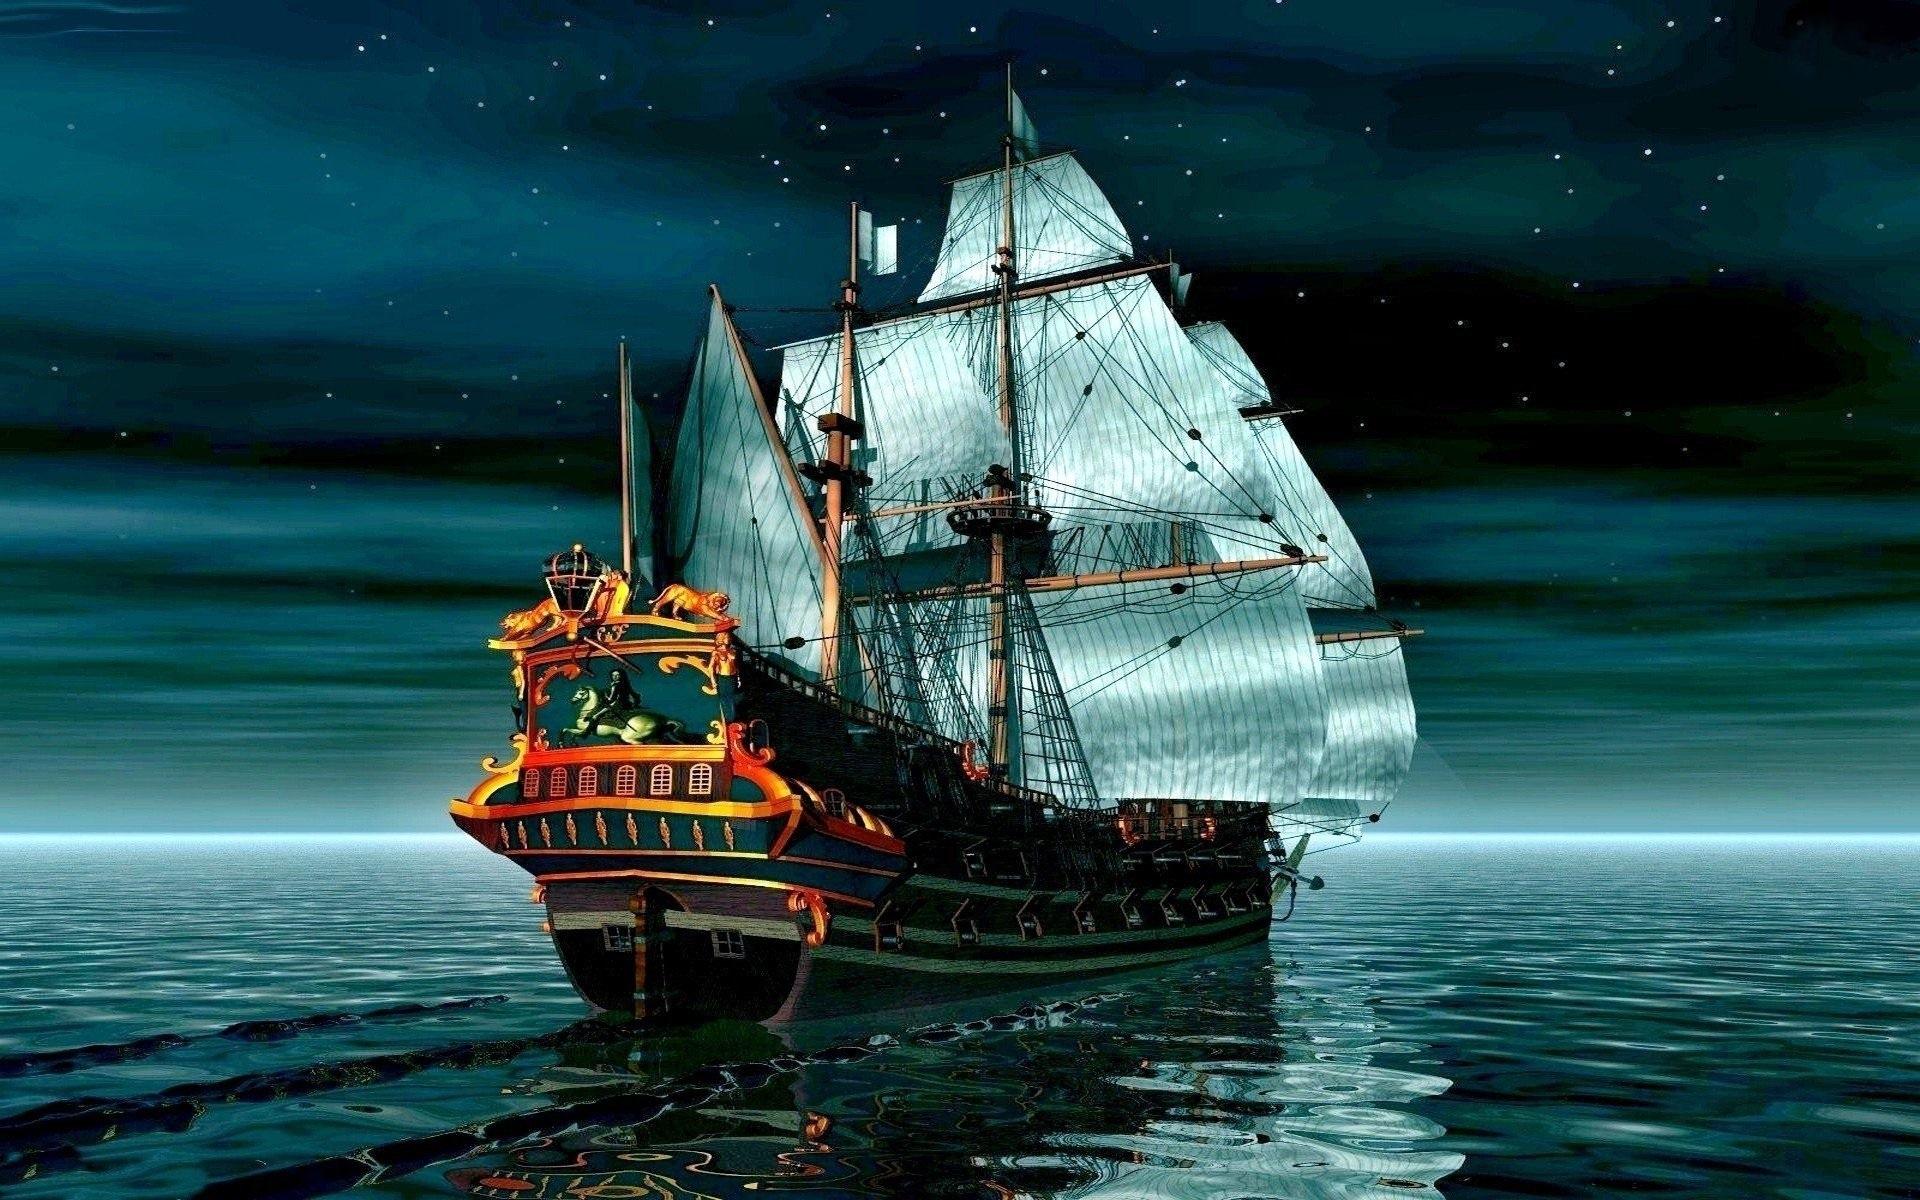 Papéis De Parede Navio De Pirata No Mar Calmo 1920x1200 HD